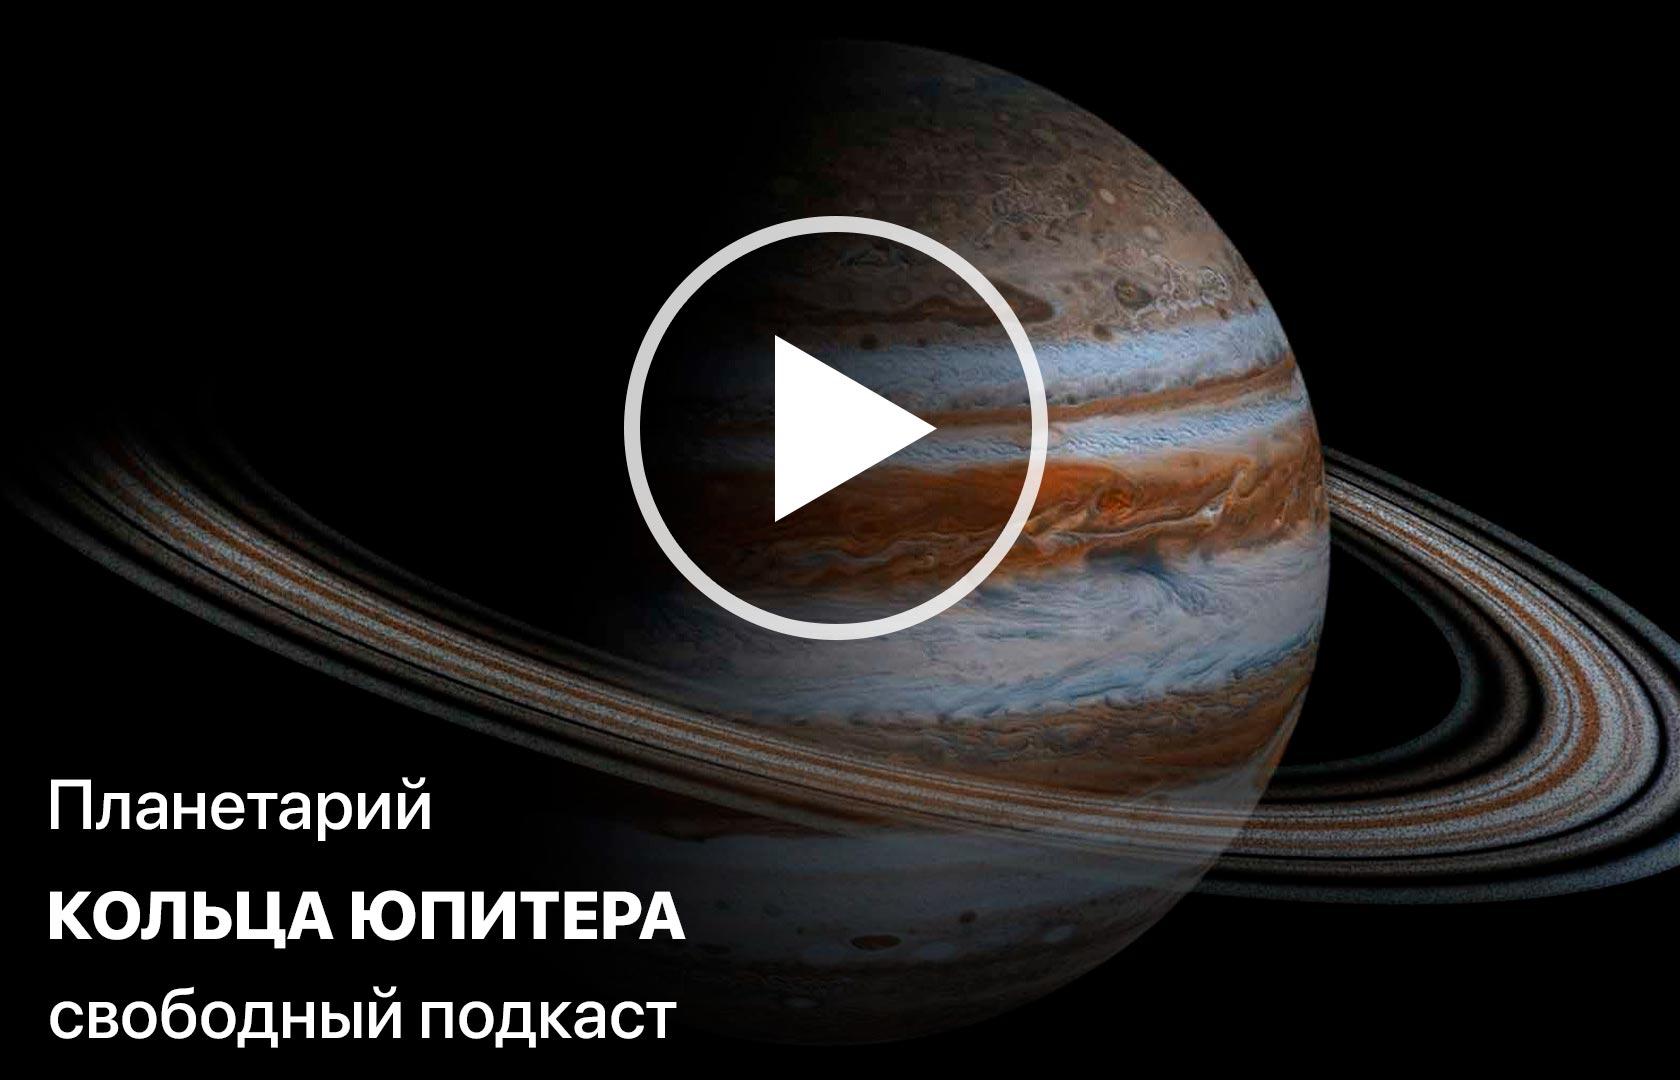 Планетарий. Кольца Юпитера